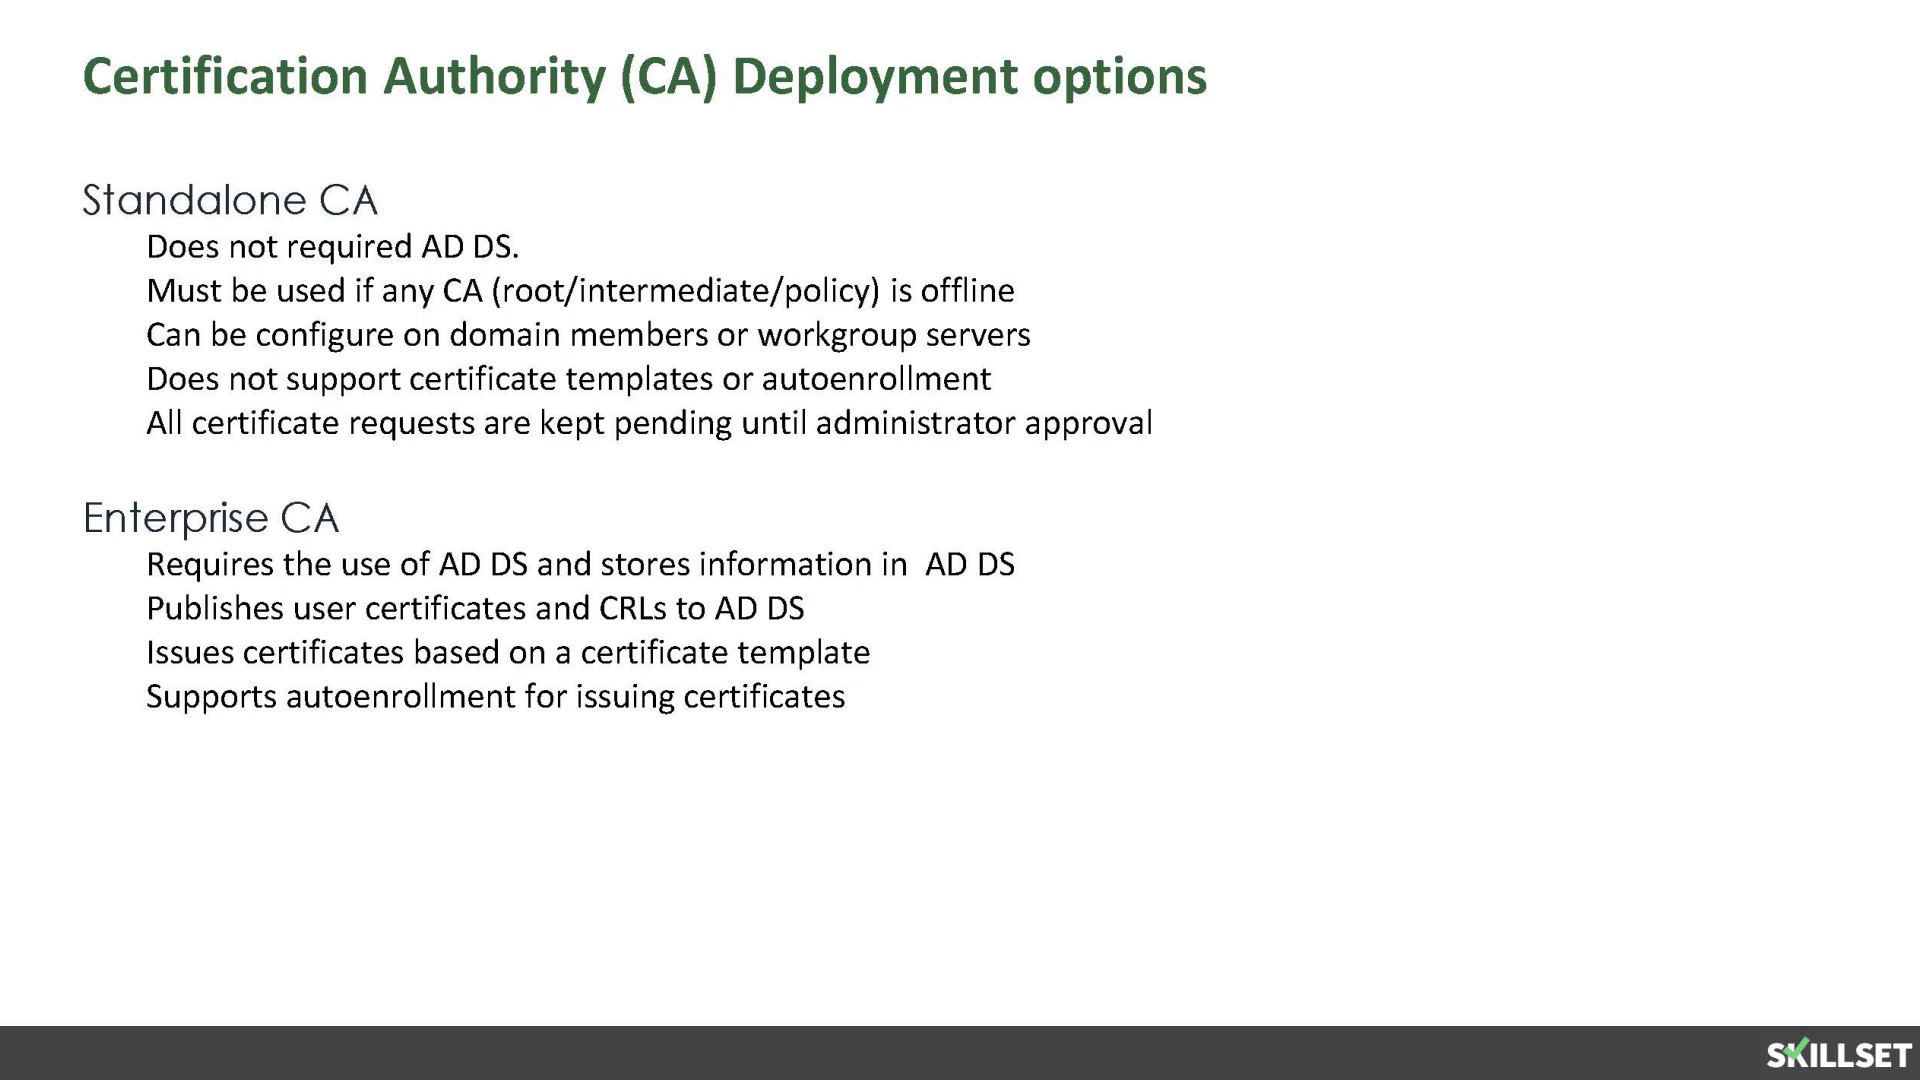 Enterprise Cas Do Not Use Certificate Templates Skillset